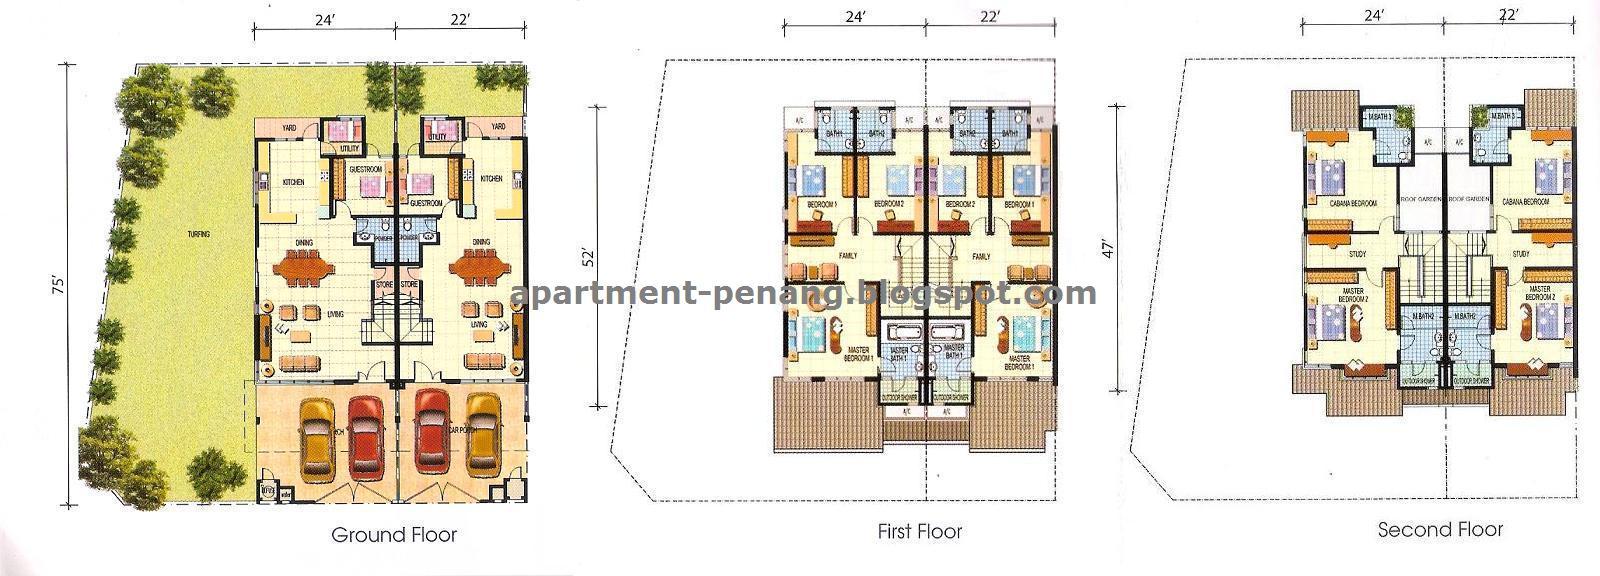 Southbay Residence | Apartment-Penang.com